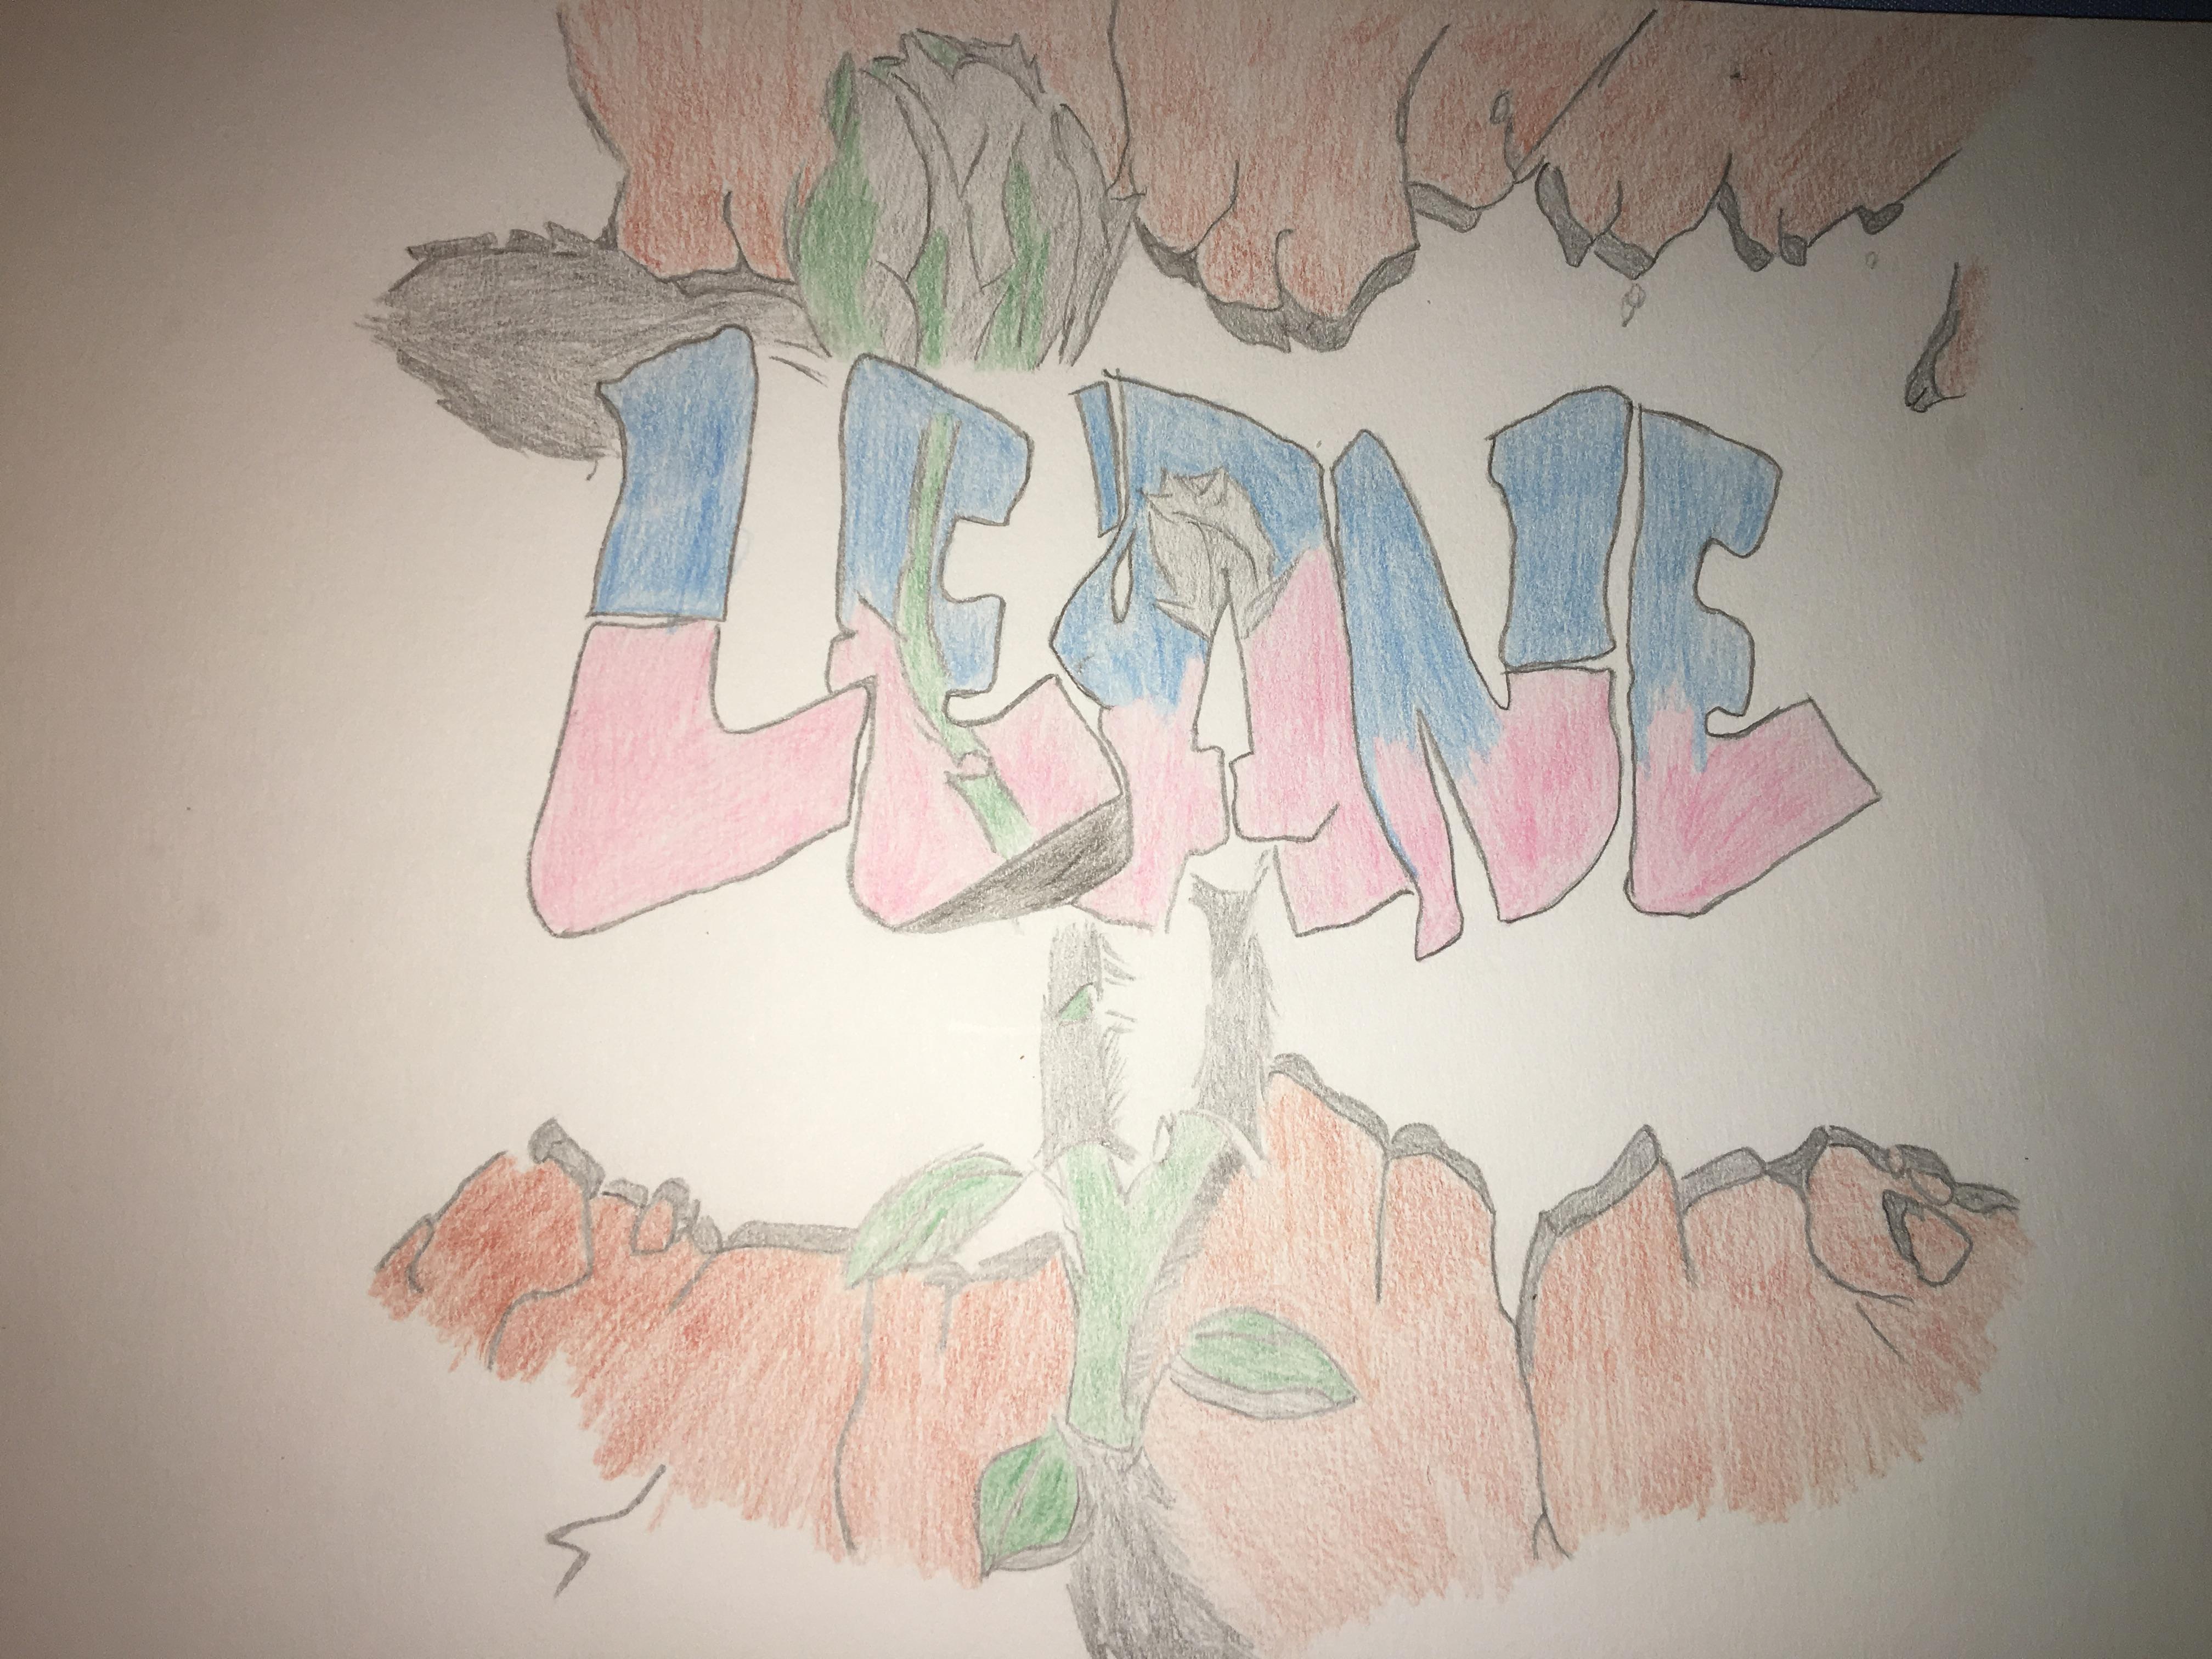 Dessin Big Bang Graf de Mogne_ldesigne